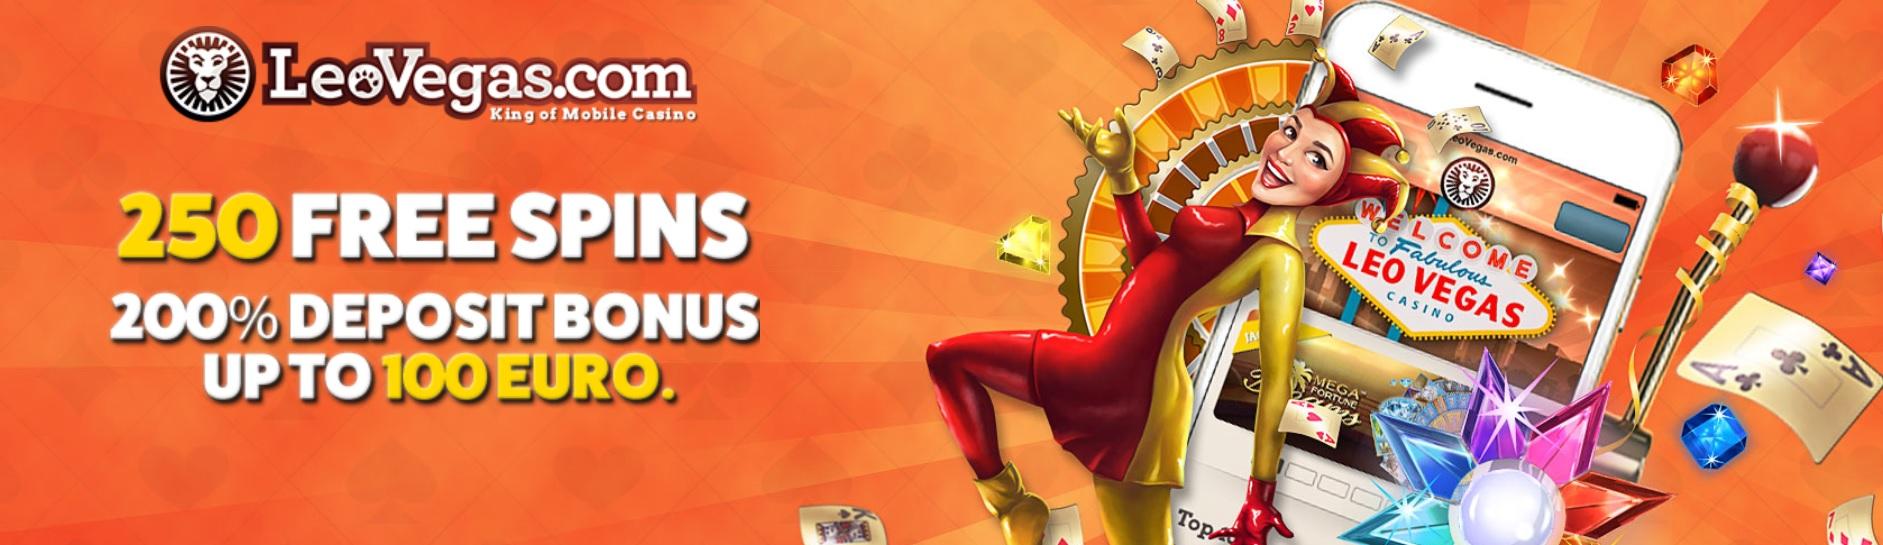 leovegas deposit bonus free spins